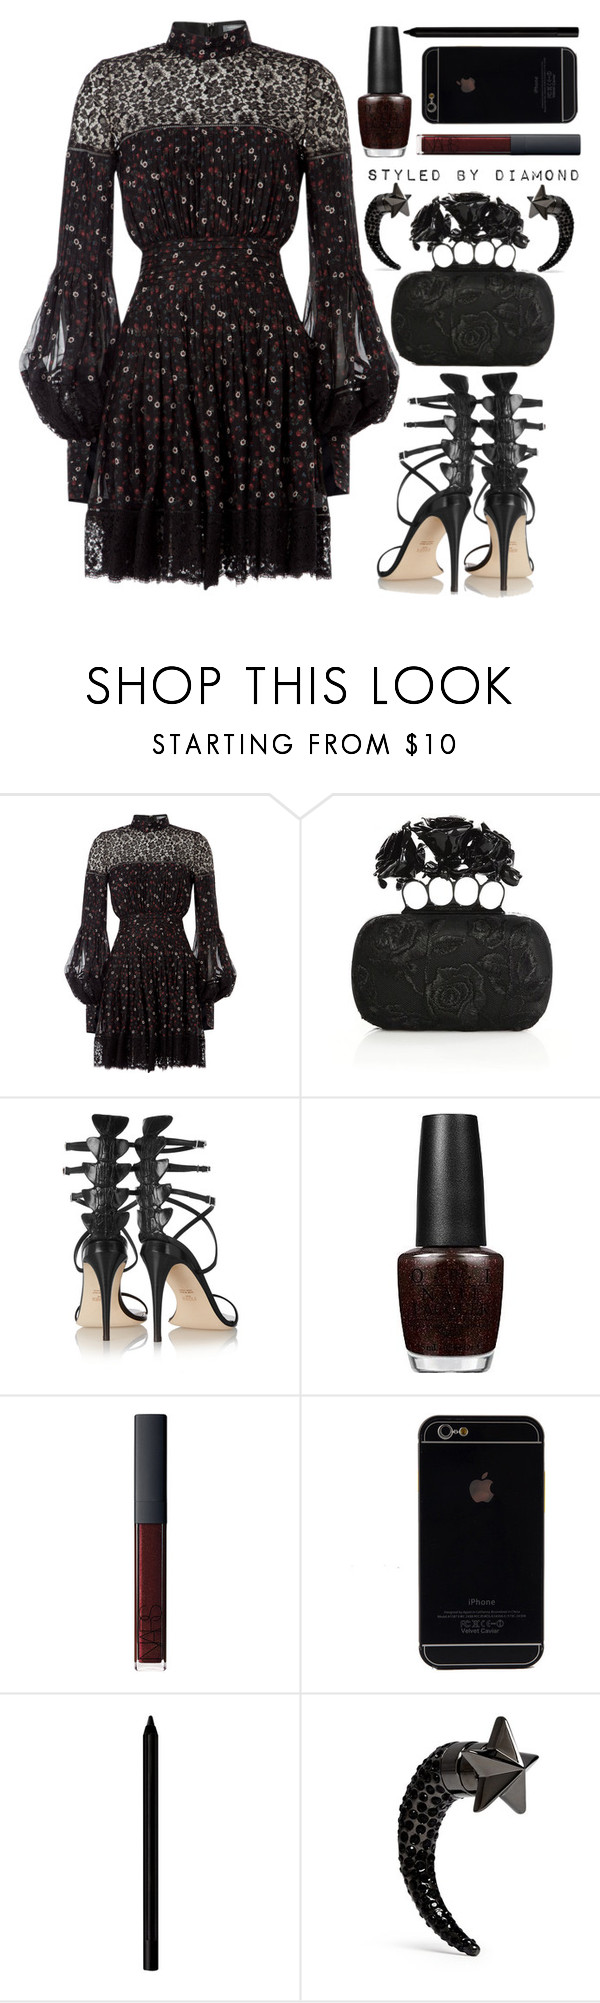 """Boa Noite"" by diamxo ❤ liked on Polyvore featuring mode, Alexander McQueen, Fendi, OPI, NARS Cosmetics, Giorgio Armani et Givenchy"